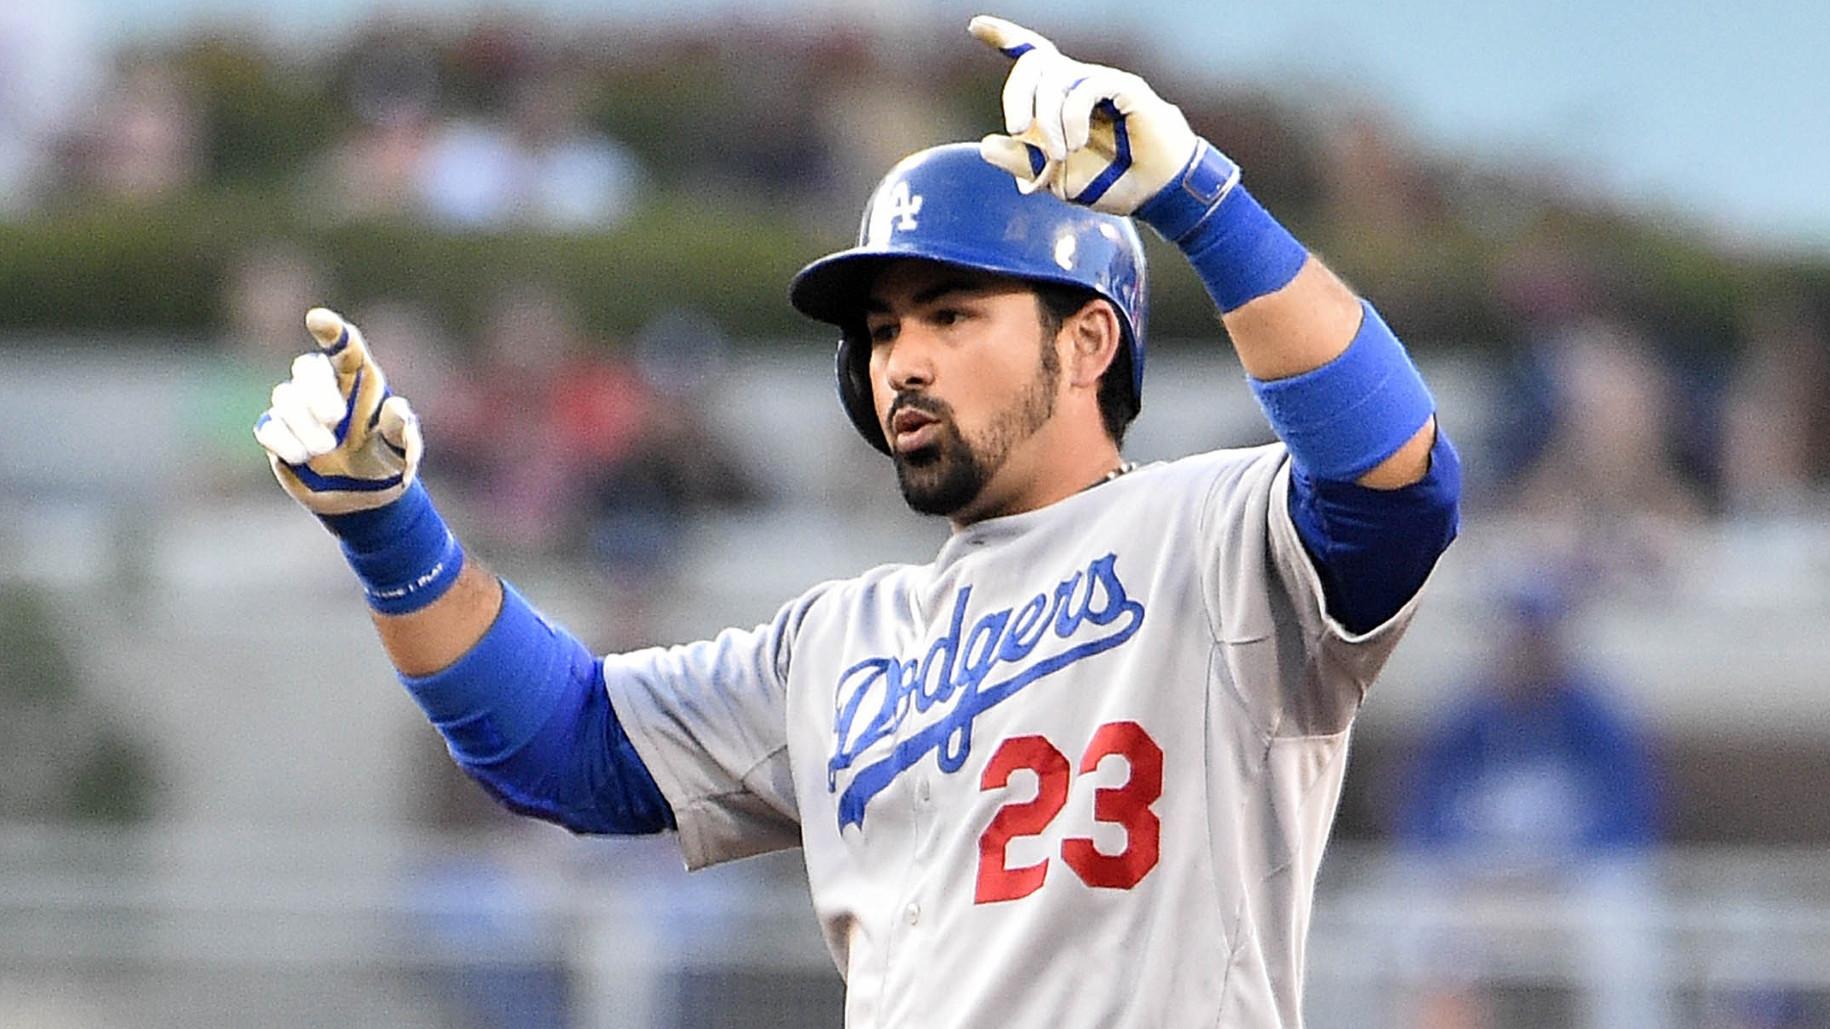 Adrián González Dodgers Regreso Vinicio Castillo Empate Récord